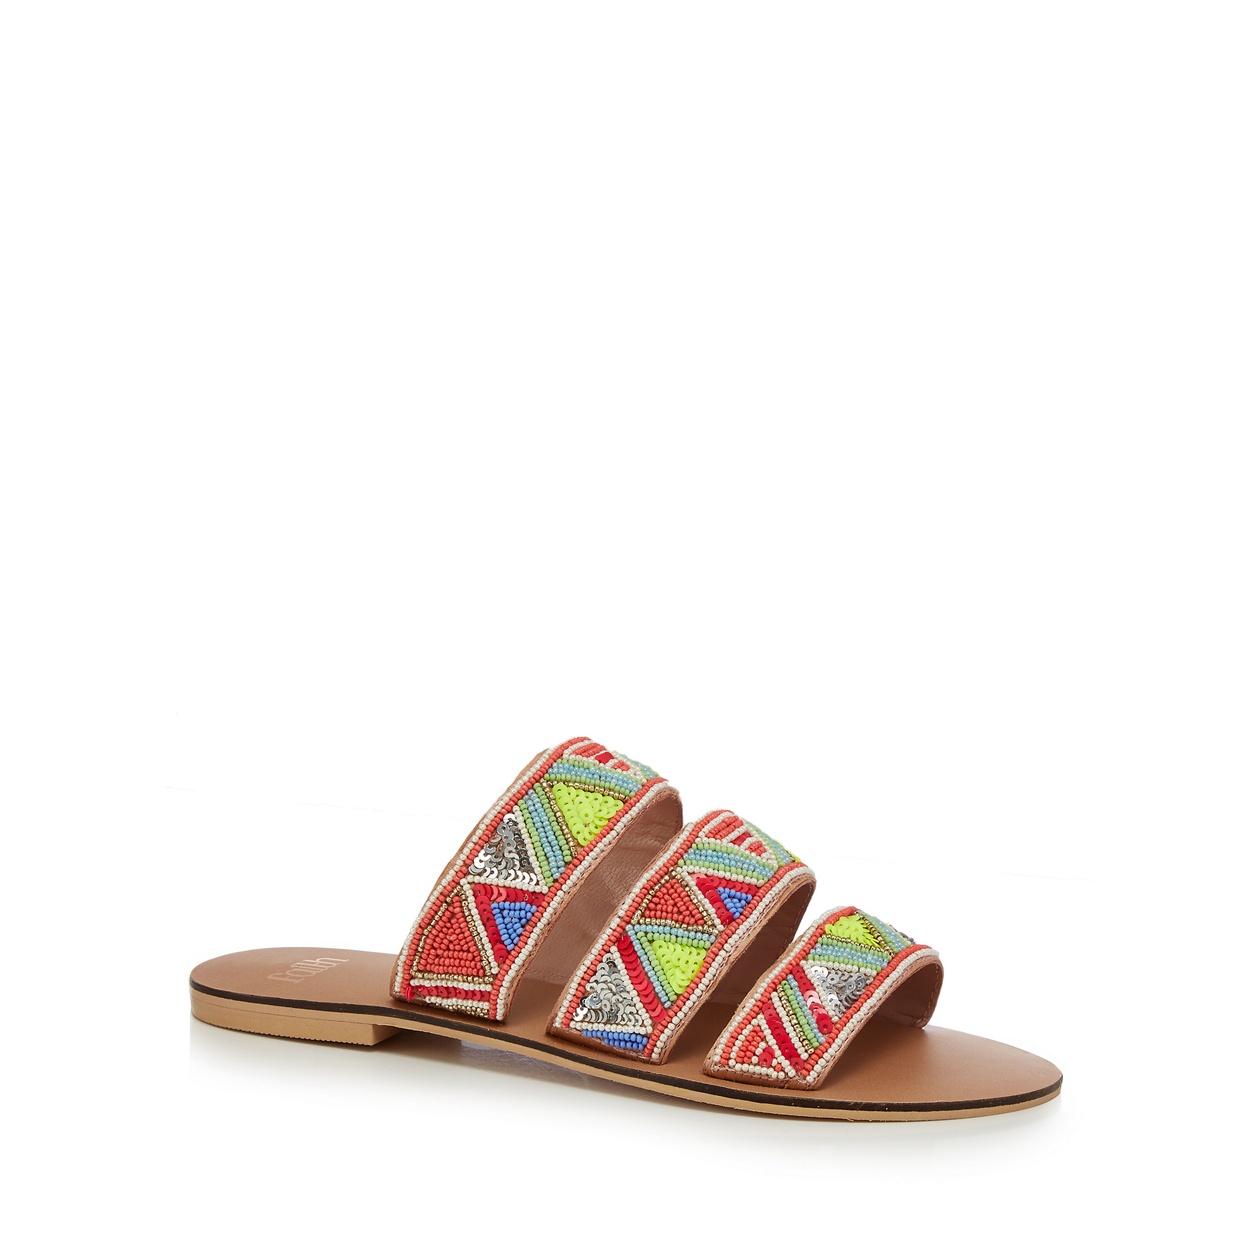 Women's sandals debenhams - Women S Shoes Sandals